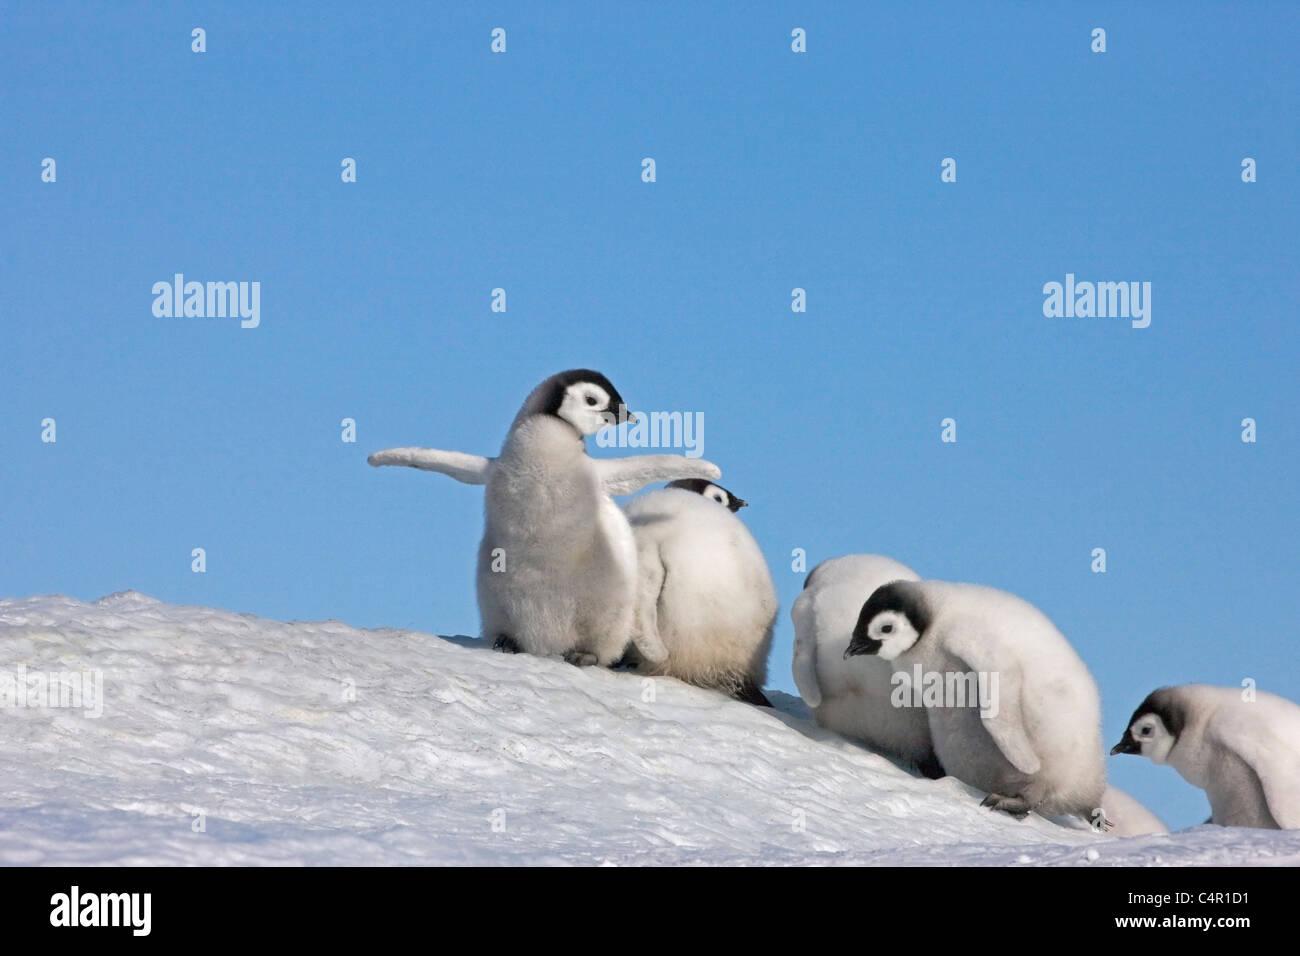 Emperor Penguin chicks on a small snow mound, Snow Hill Island, Antarctica - Stock Image